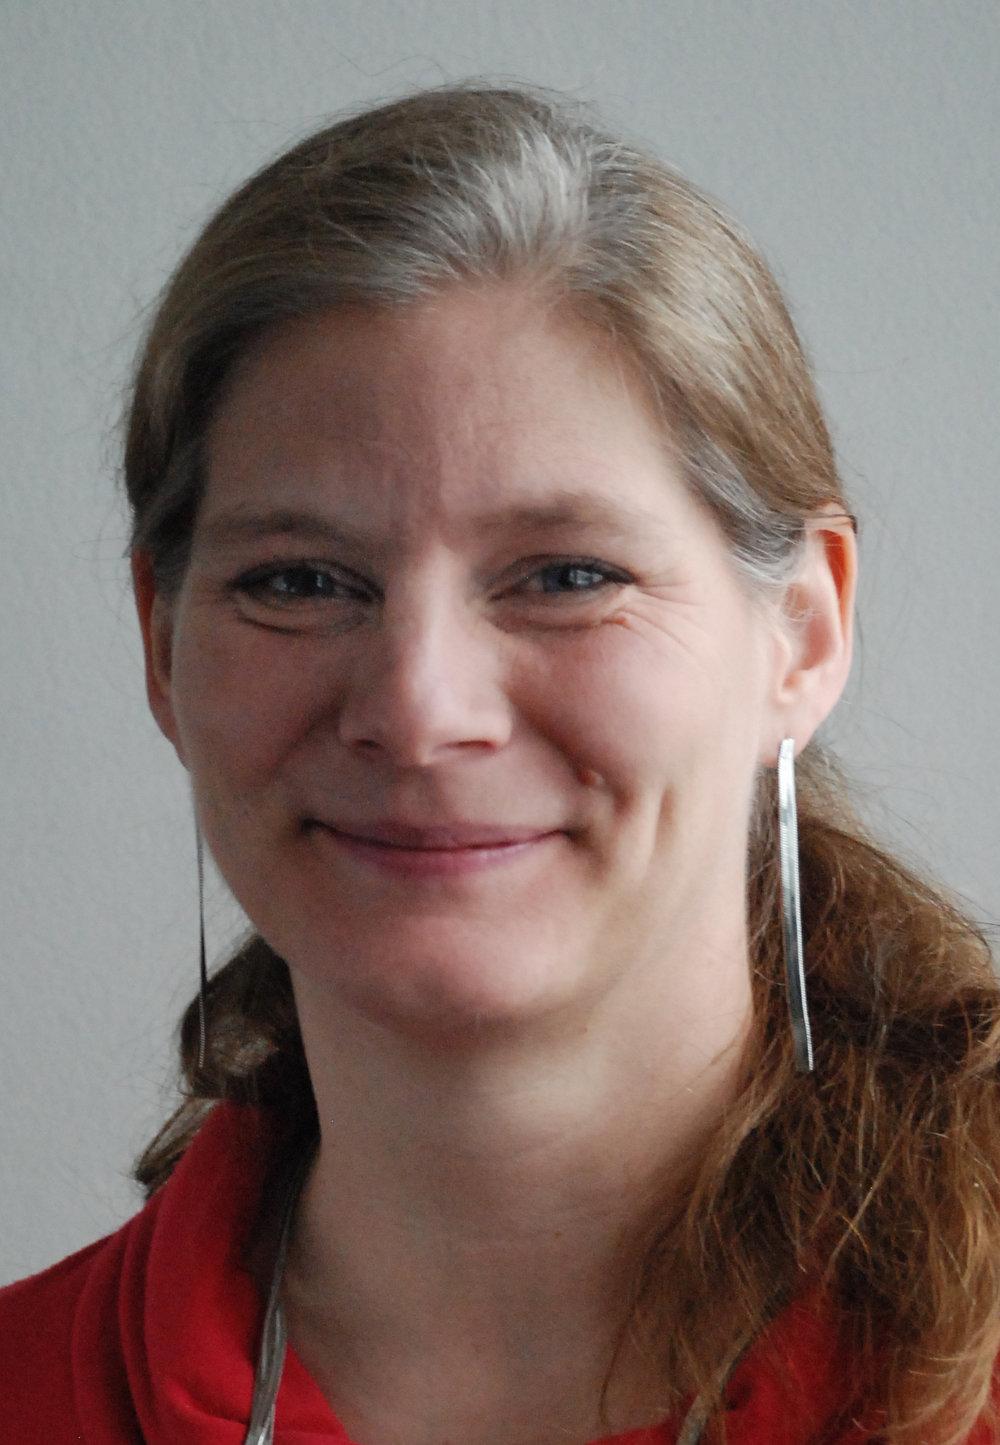 Kristina Neimert Carne, Tekn. Dr.i Organisk kemi, produktutvecklare och teknisk support, Kemiintressen